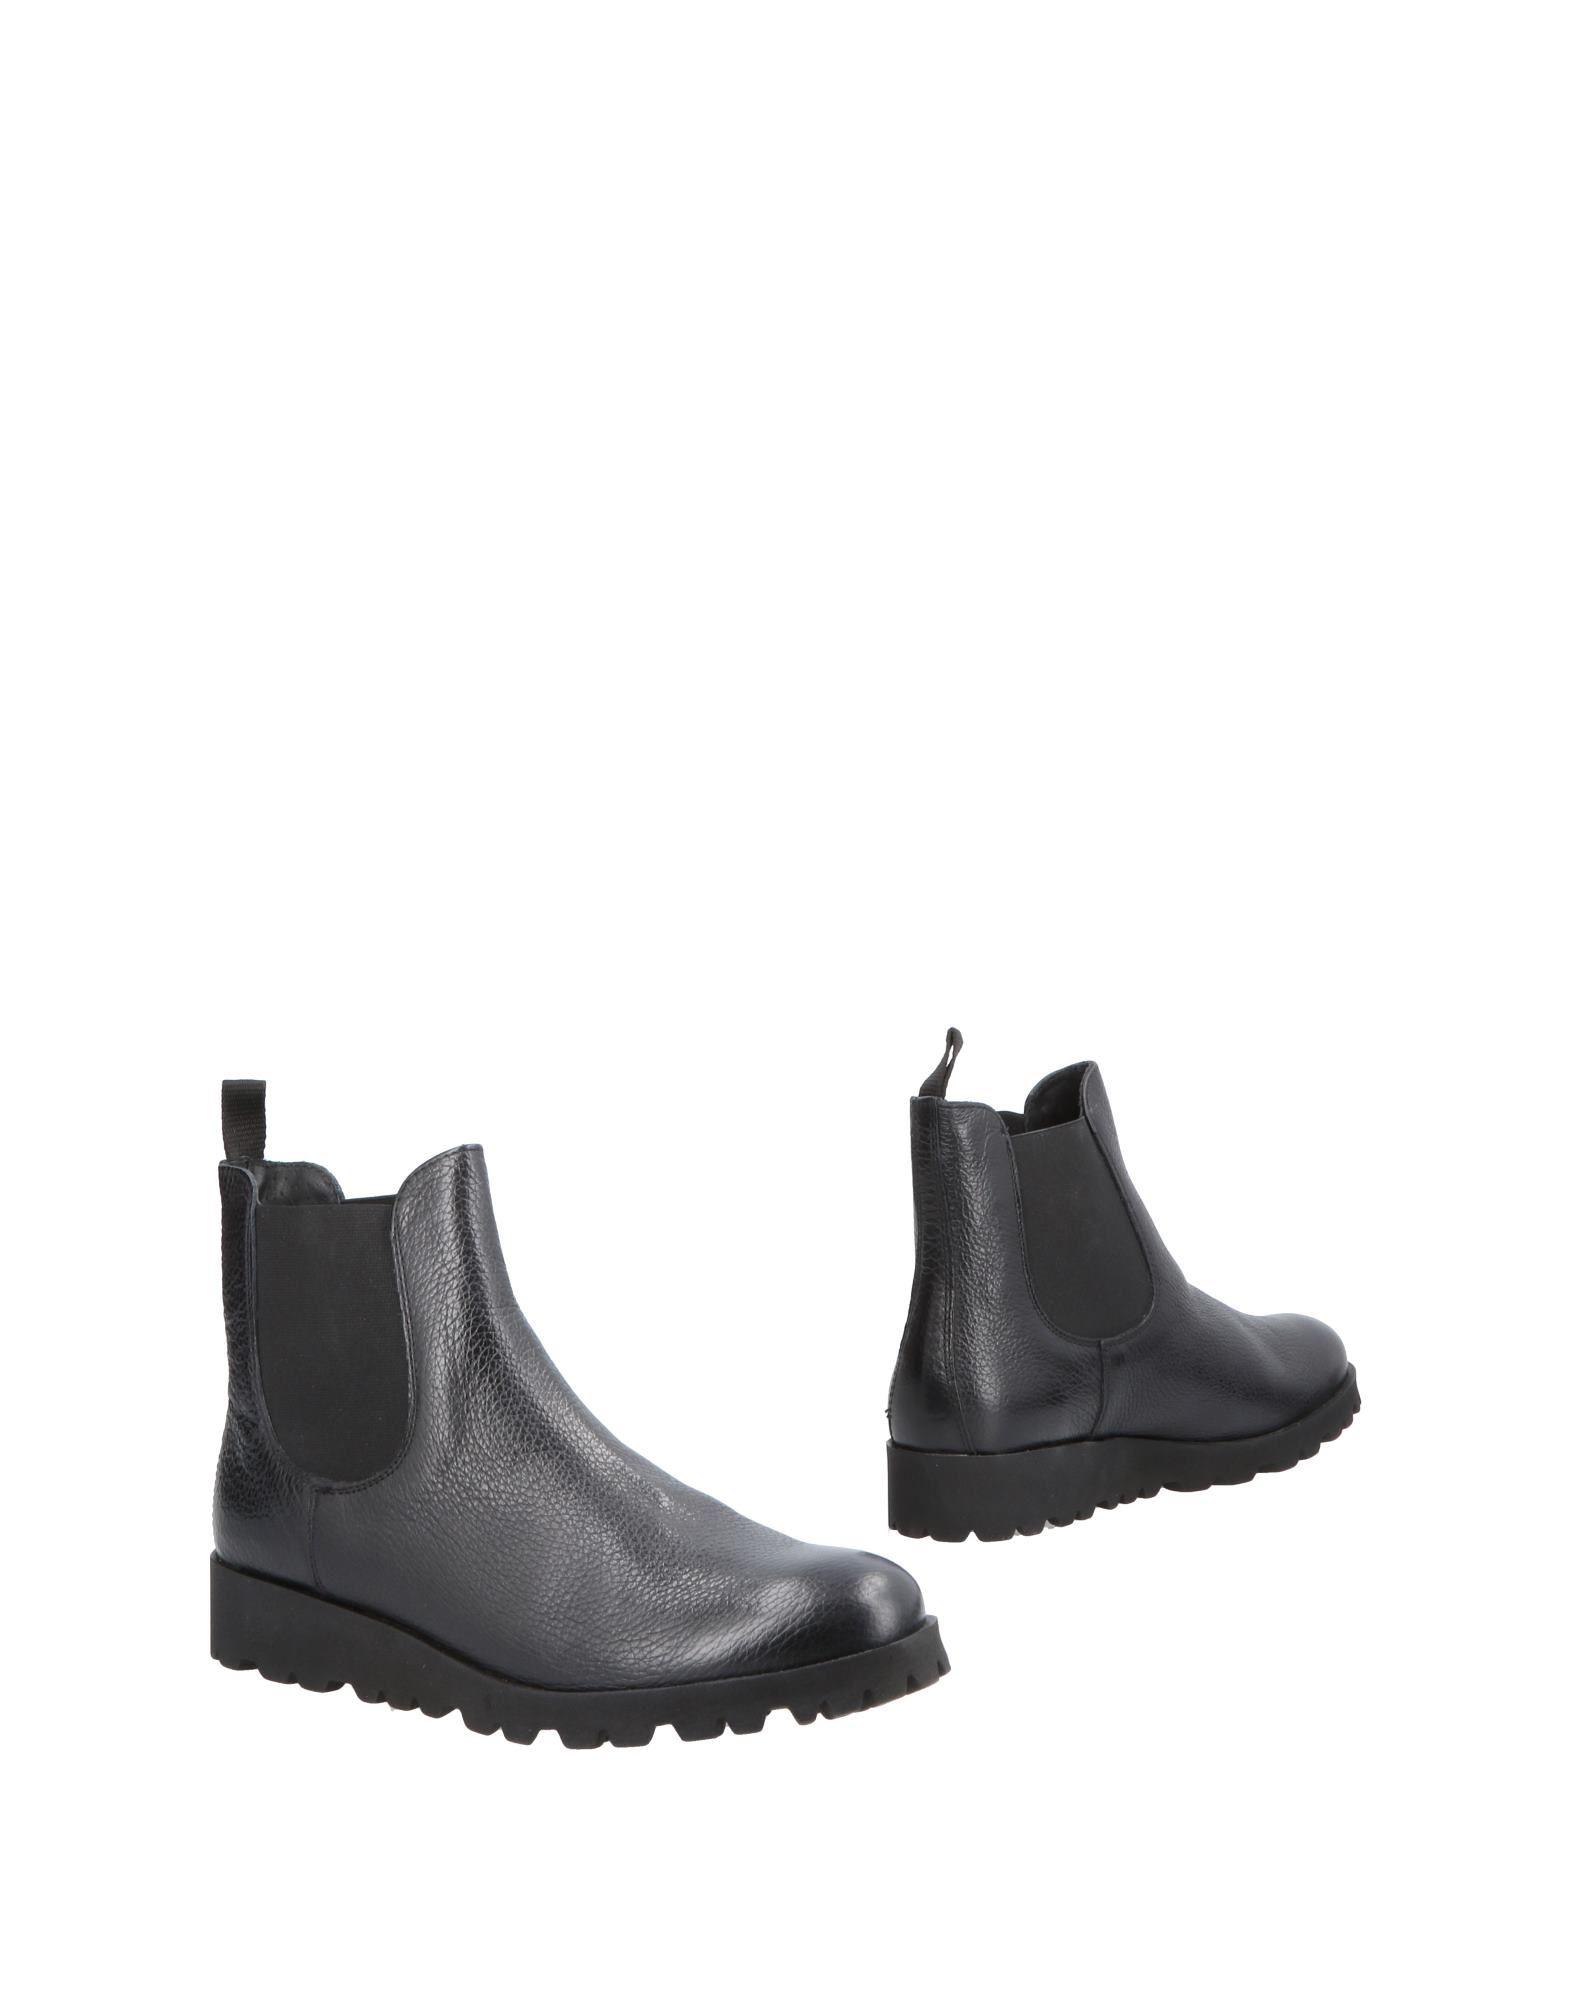 Anderson Chelsea Boots Damen  11505286MA Gute Qualität beliebte Schuhe